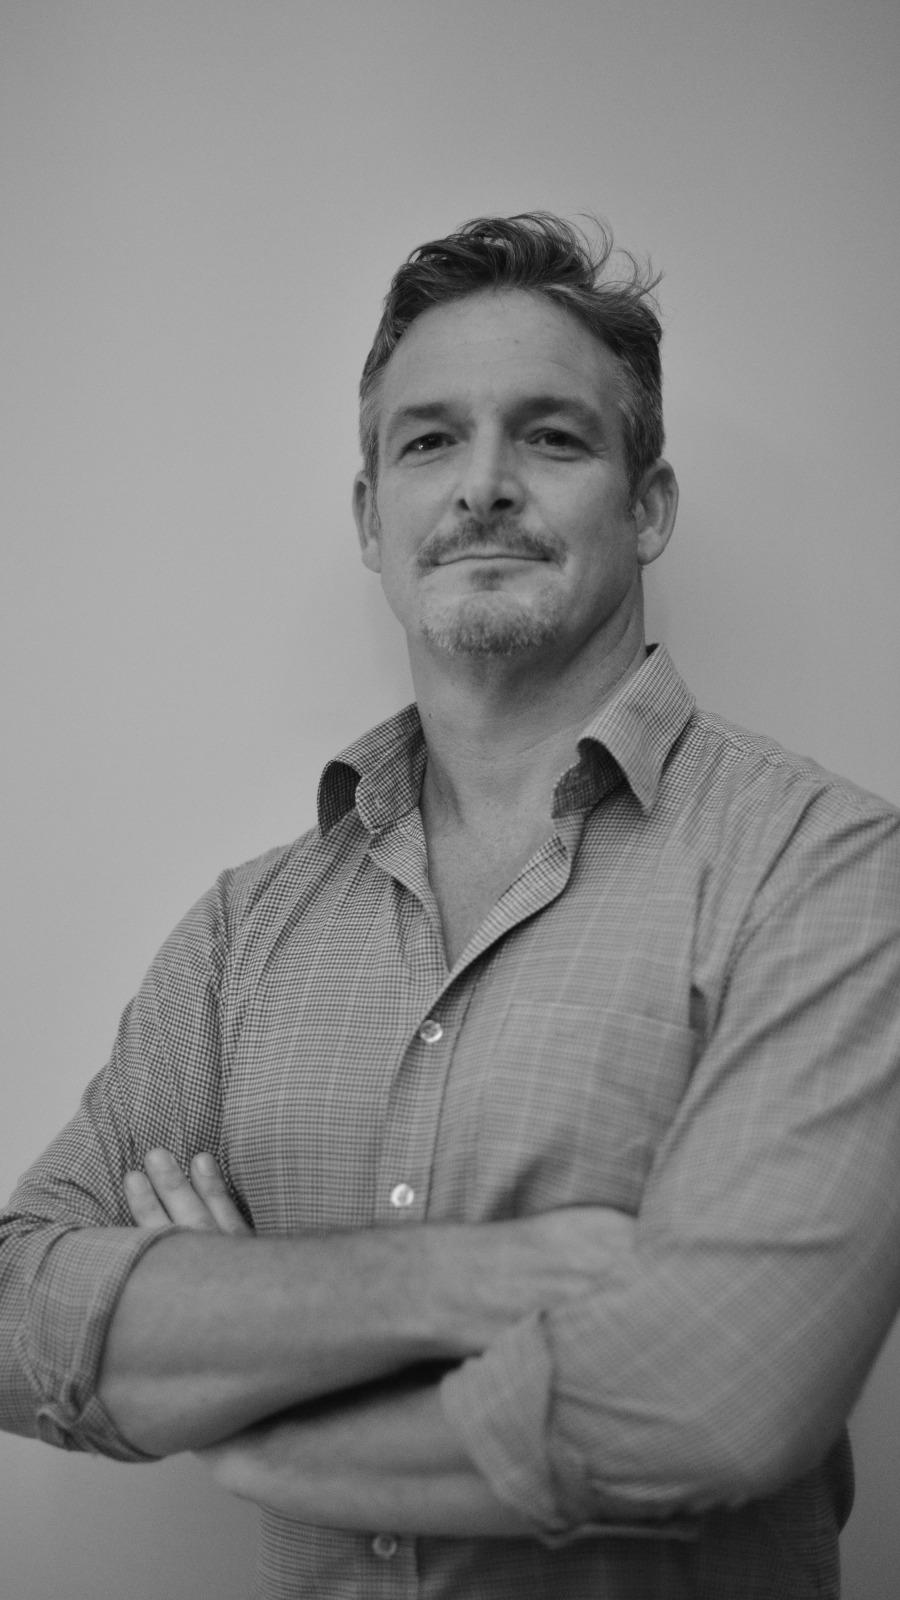 Sean Stella